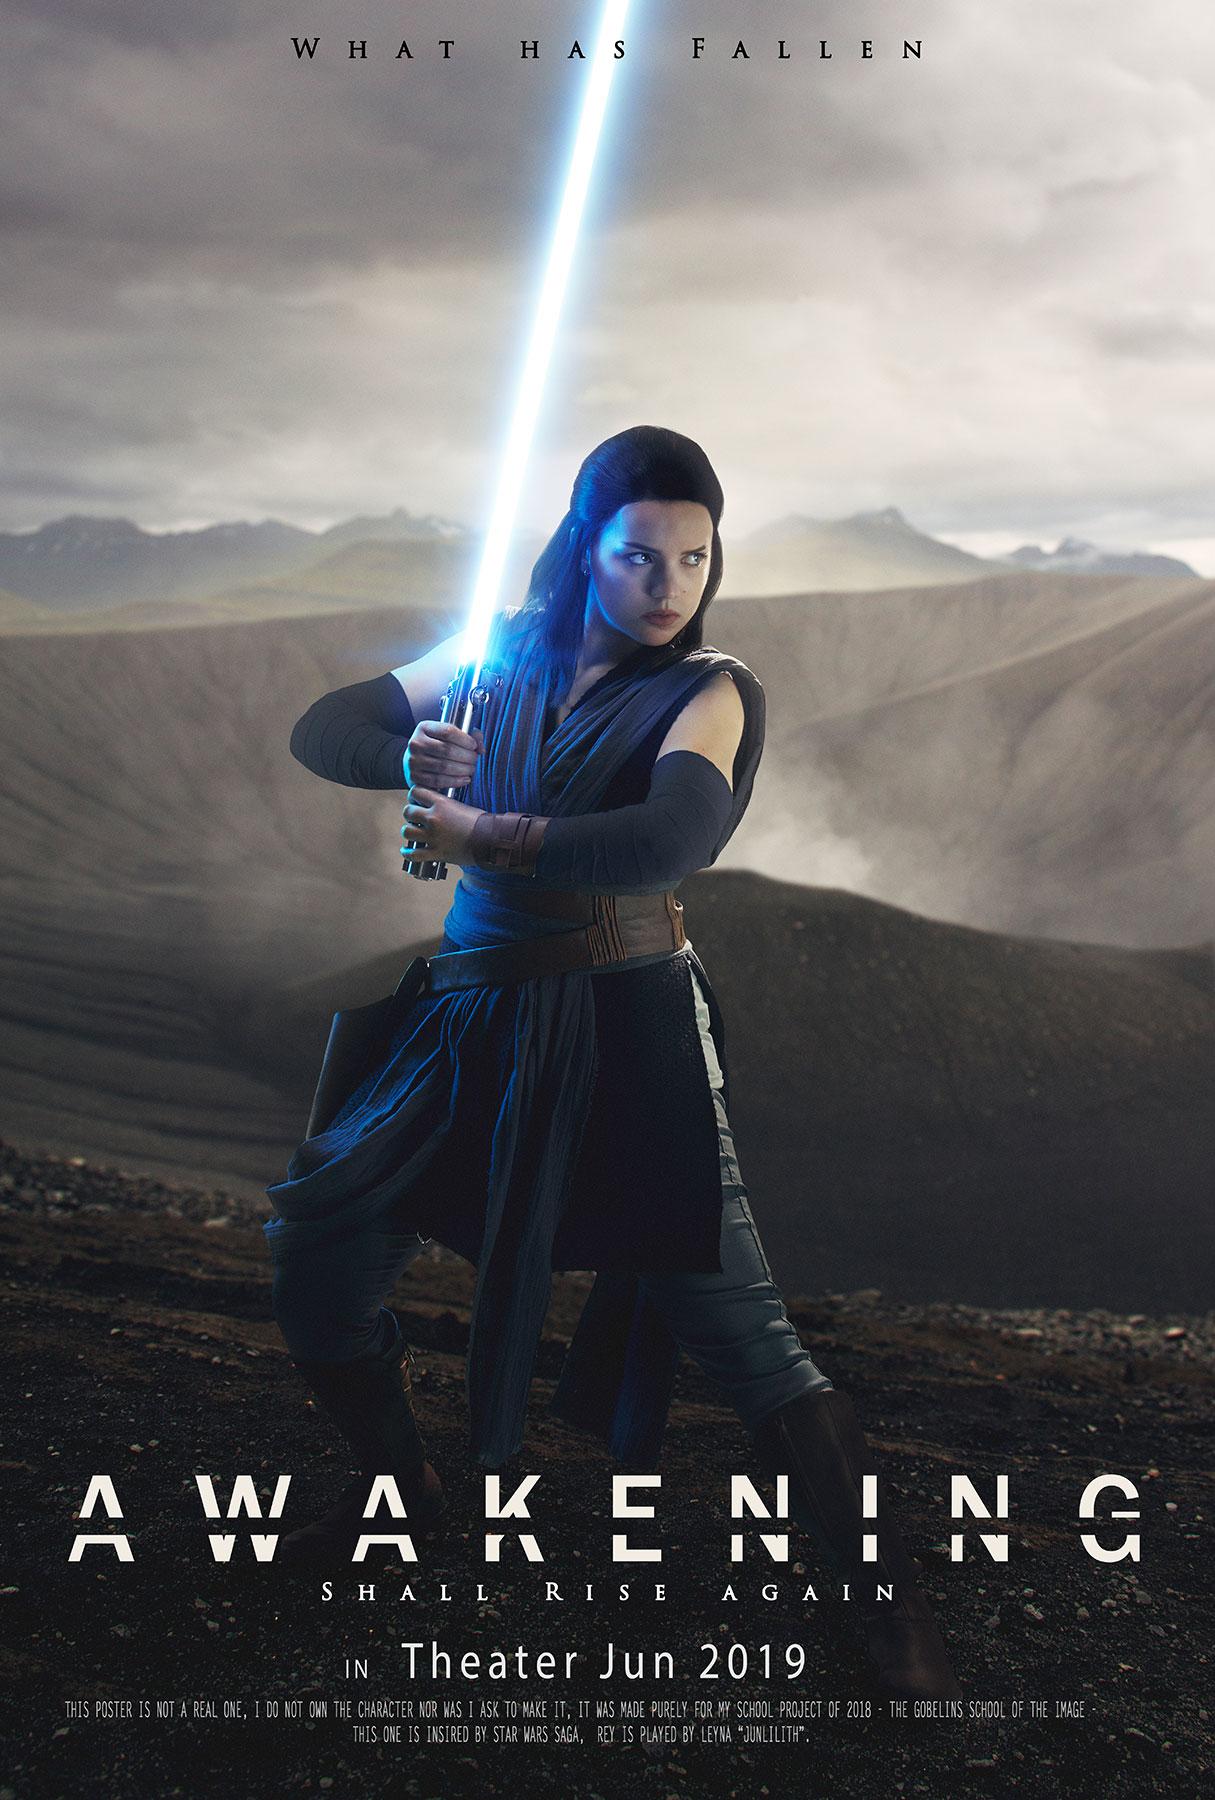 Arthur Sayanoff Rey Star Wars 11 11